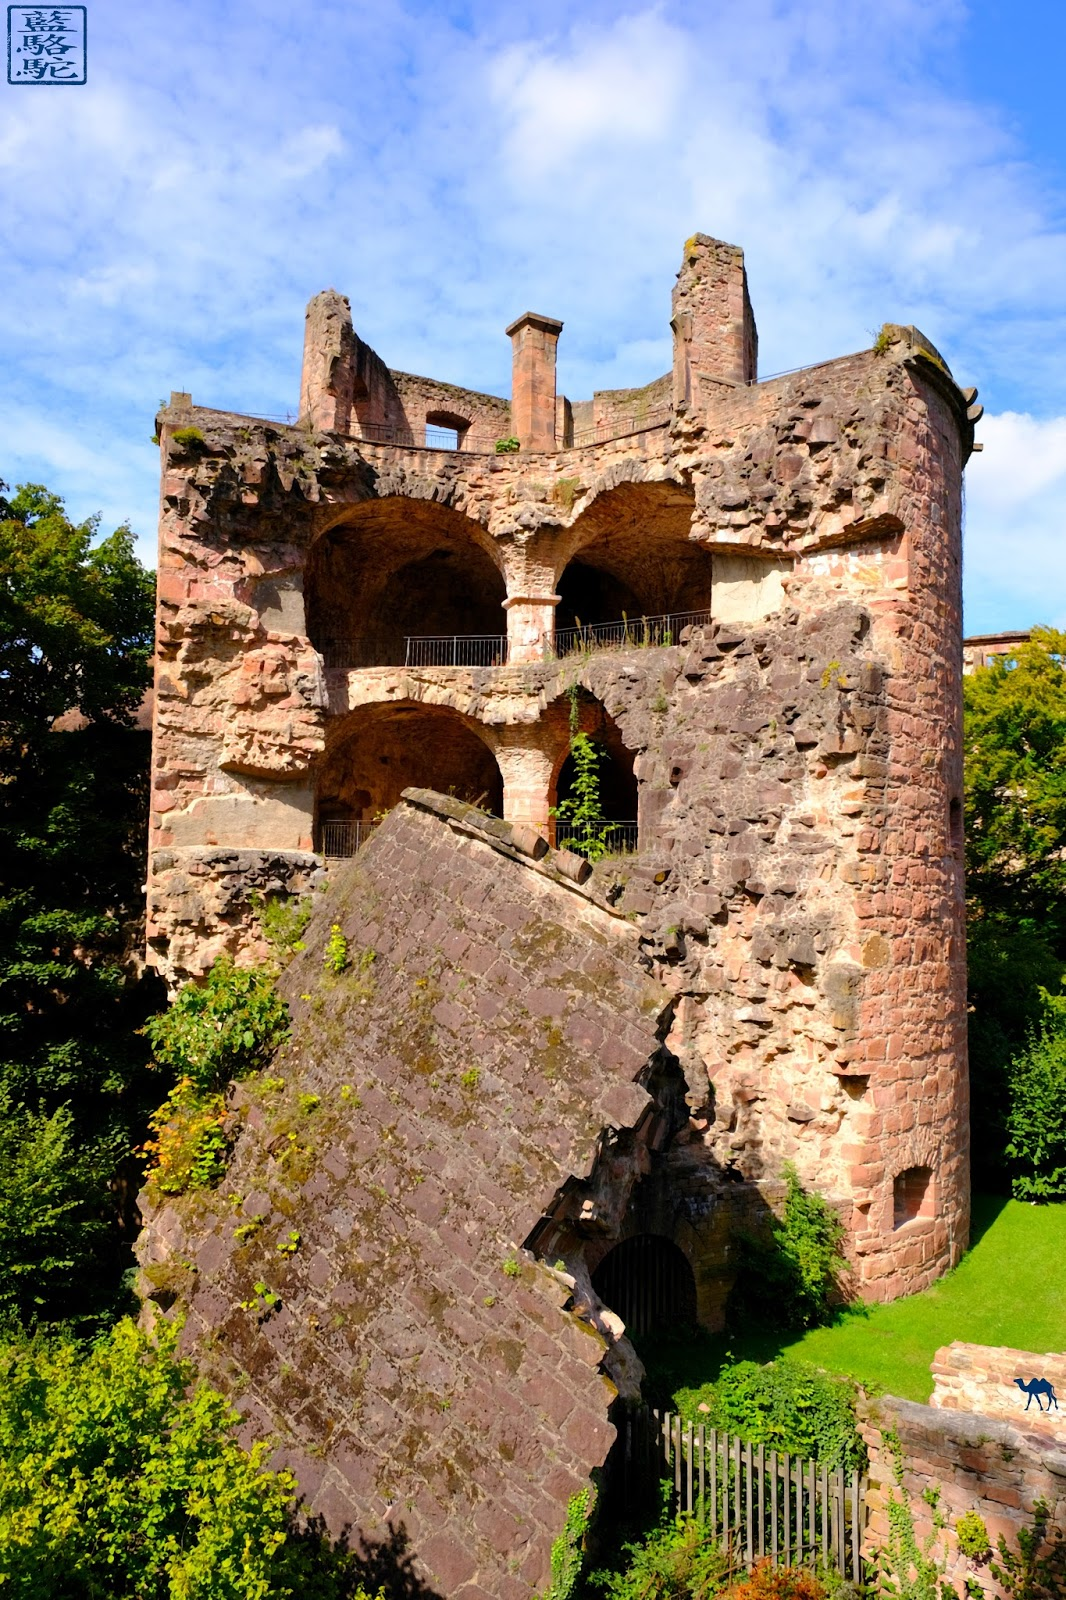 Le Chameau Bleu - Chateau Heidelberg - Tour